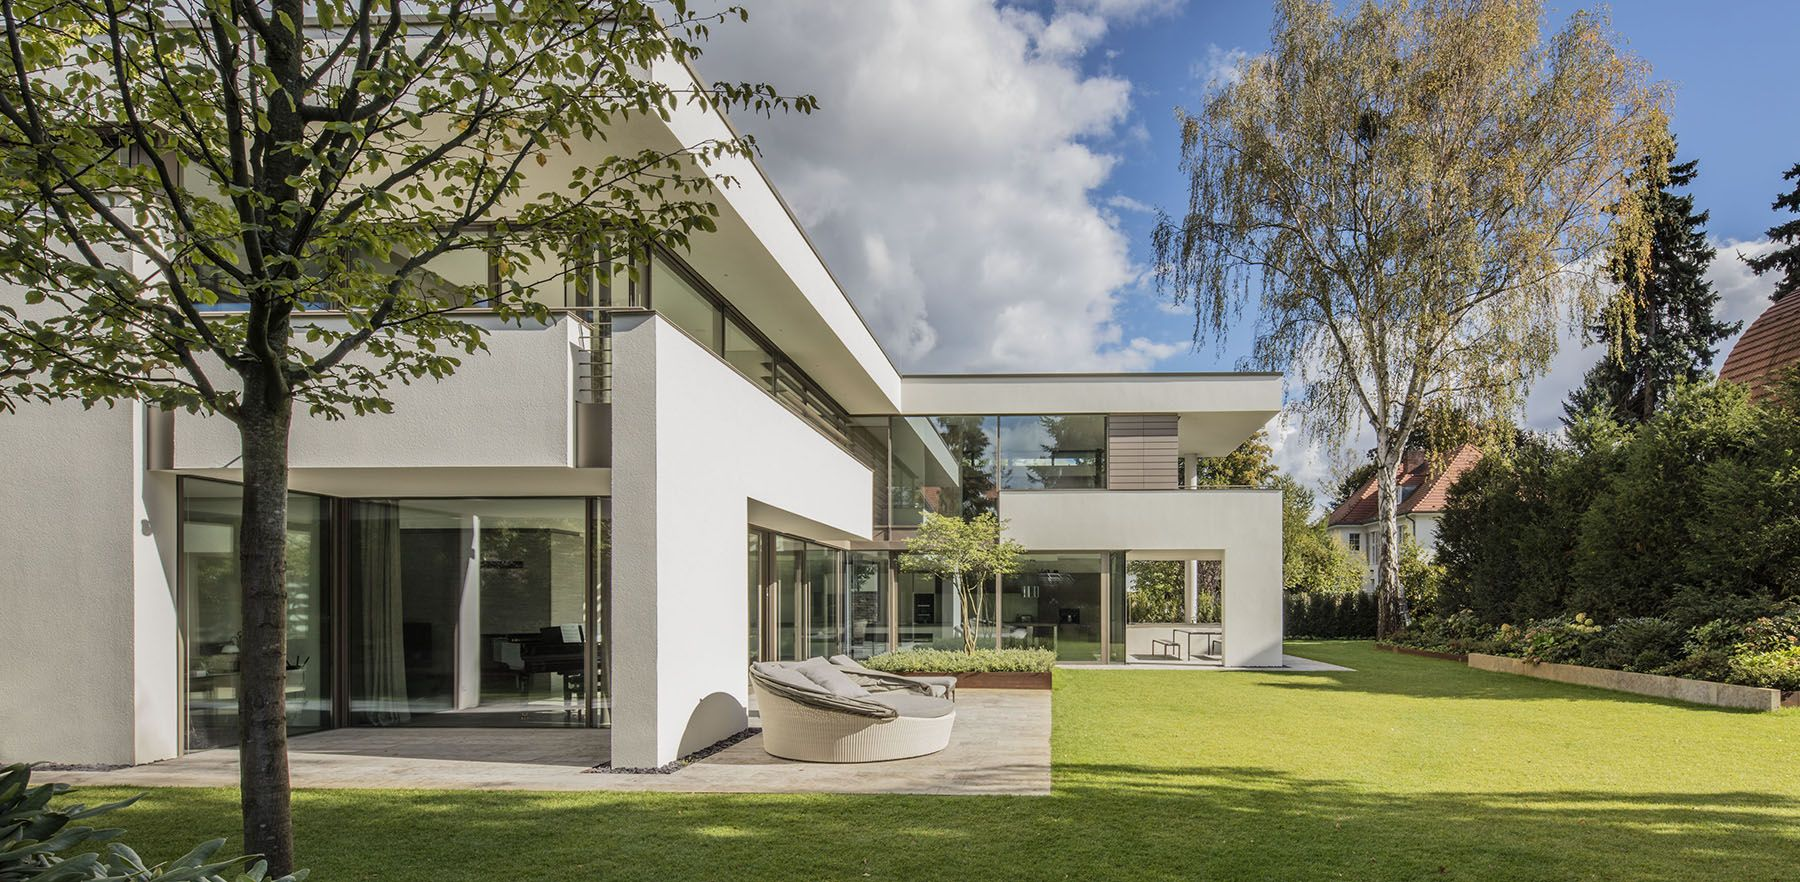 Elegant Projekt   Haus DS Stuttgart | Architekten Bda: Fuchs, Wacker.